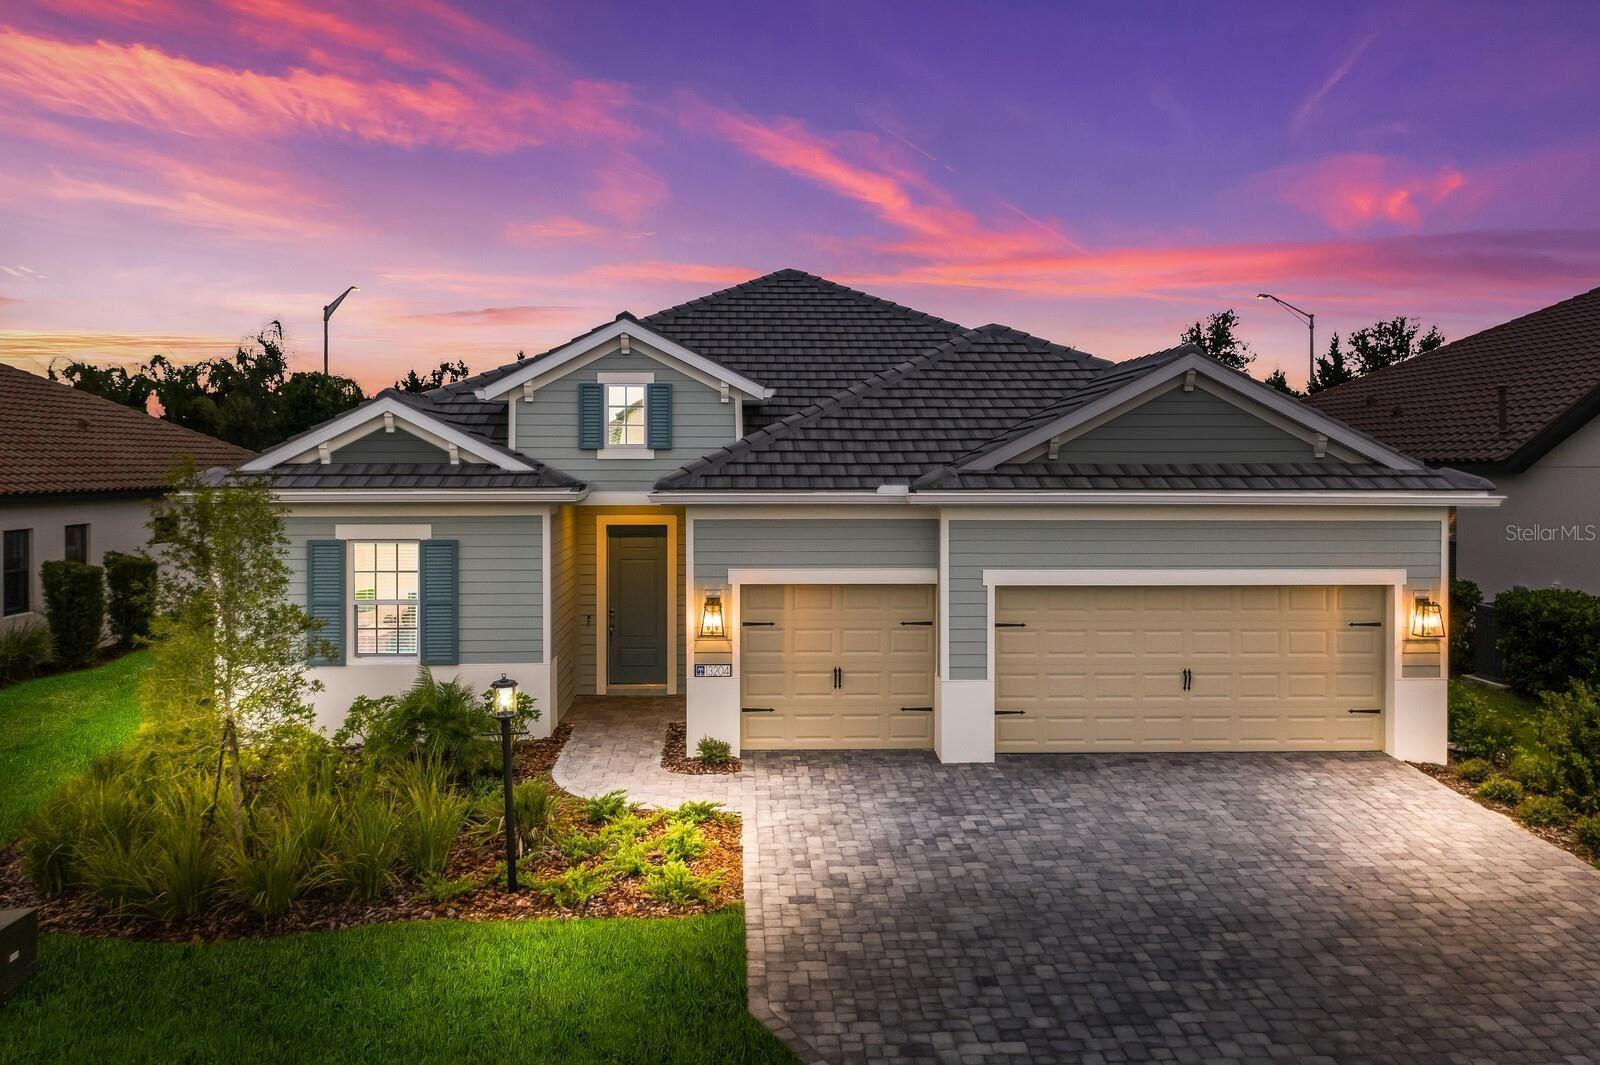 13204 DEEP BLUE PLACE, Bradenton, FL 34211 - #: A4511763